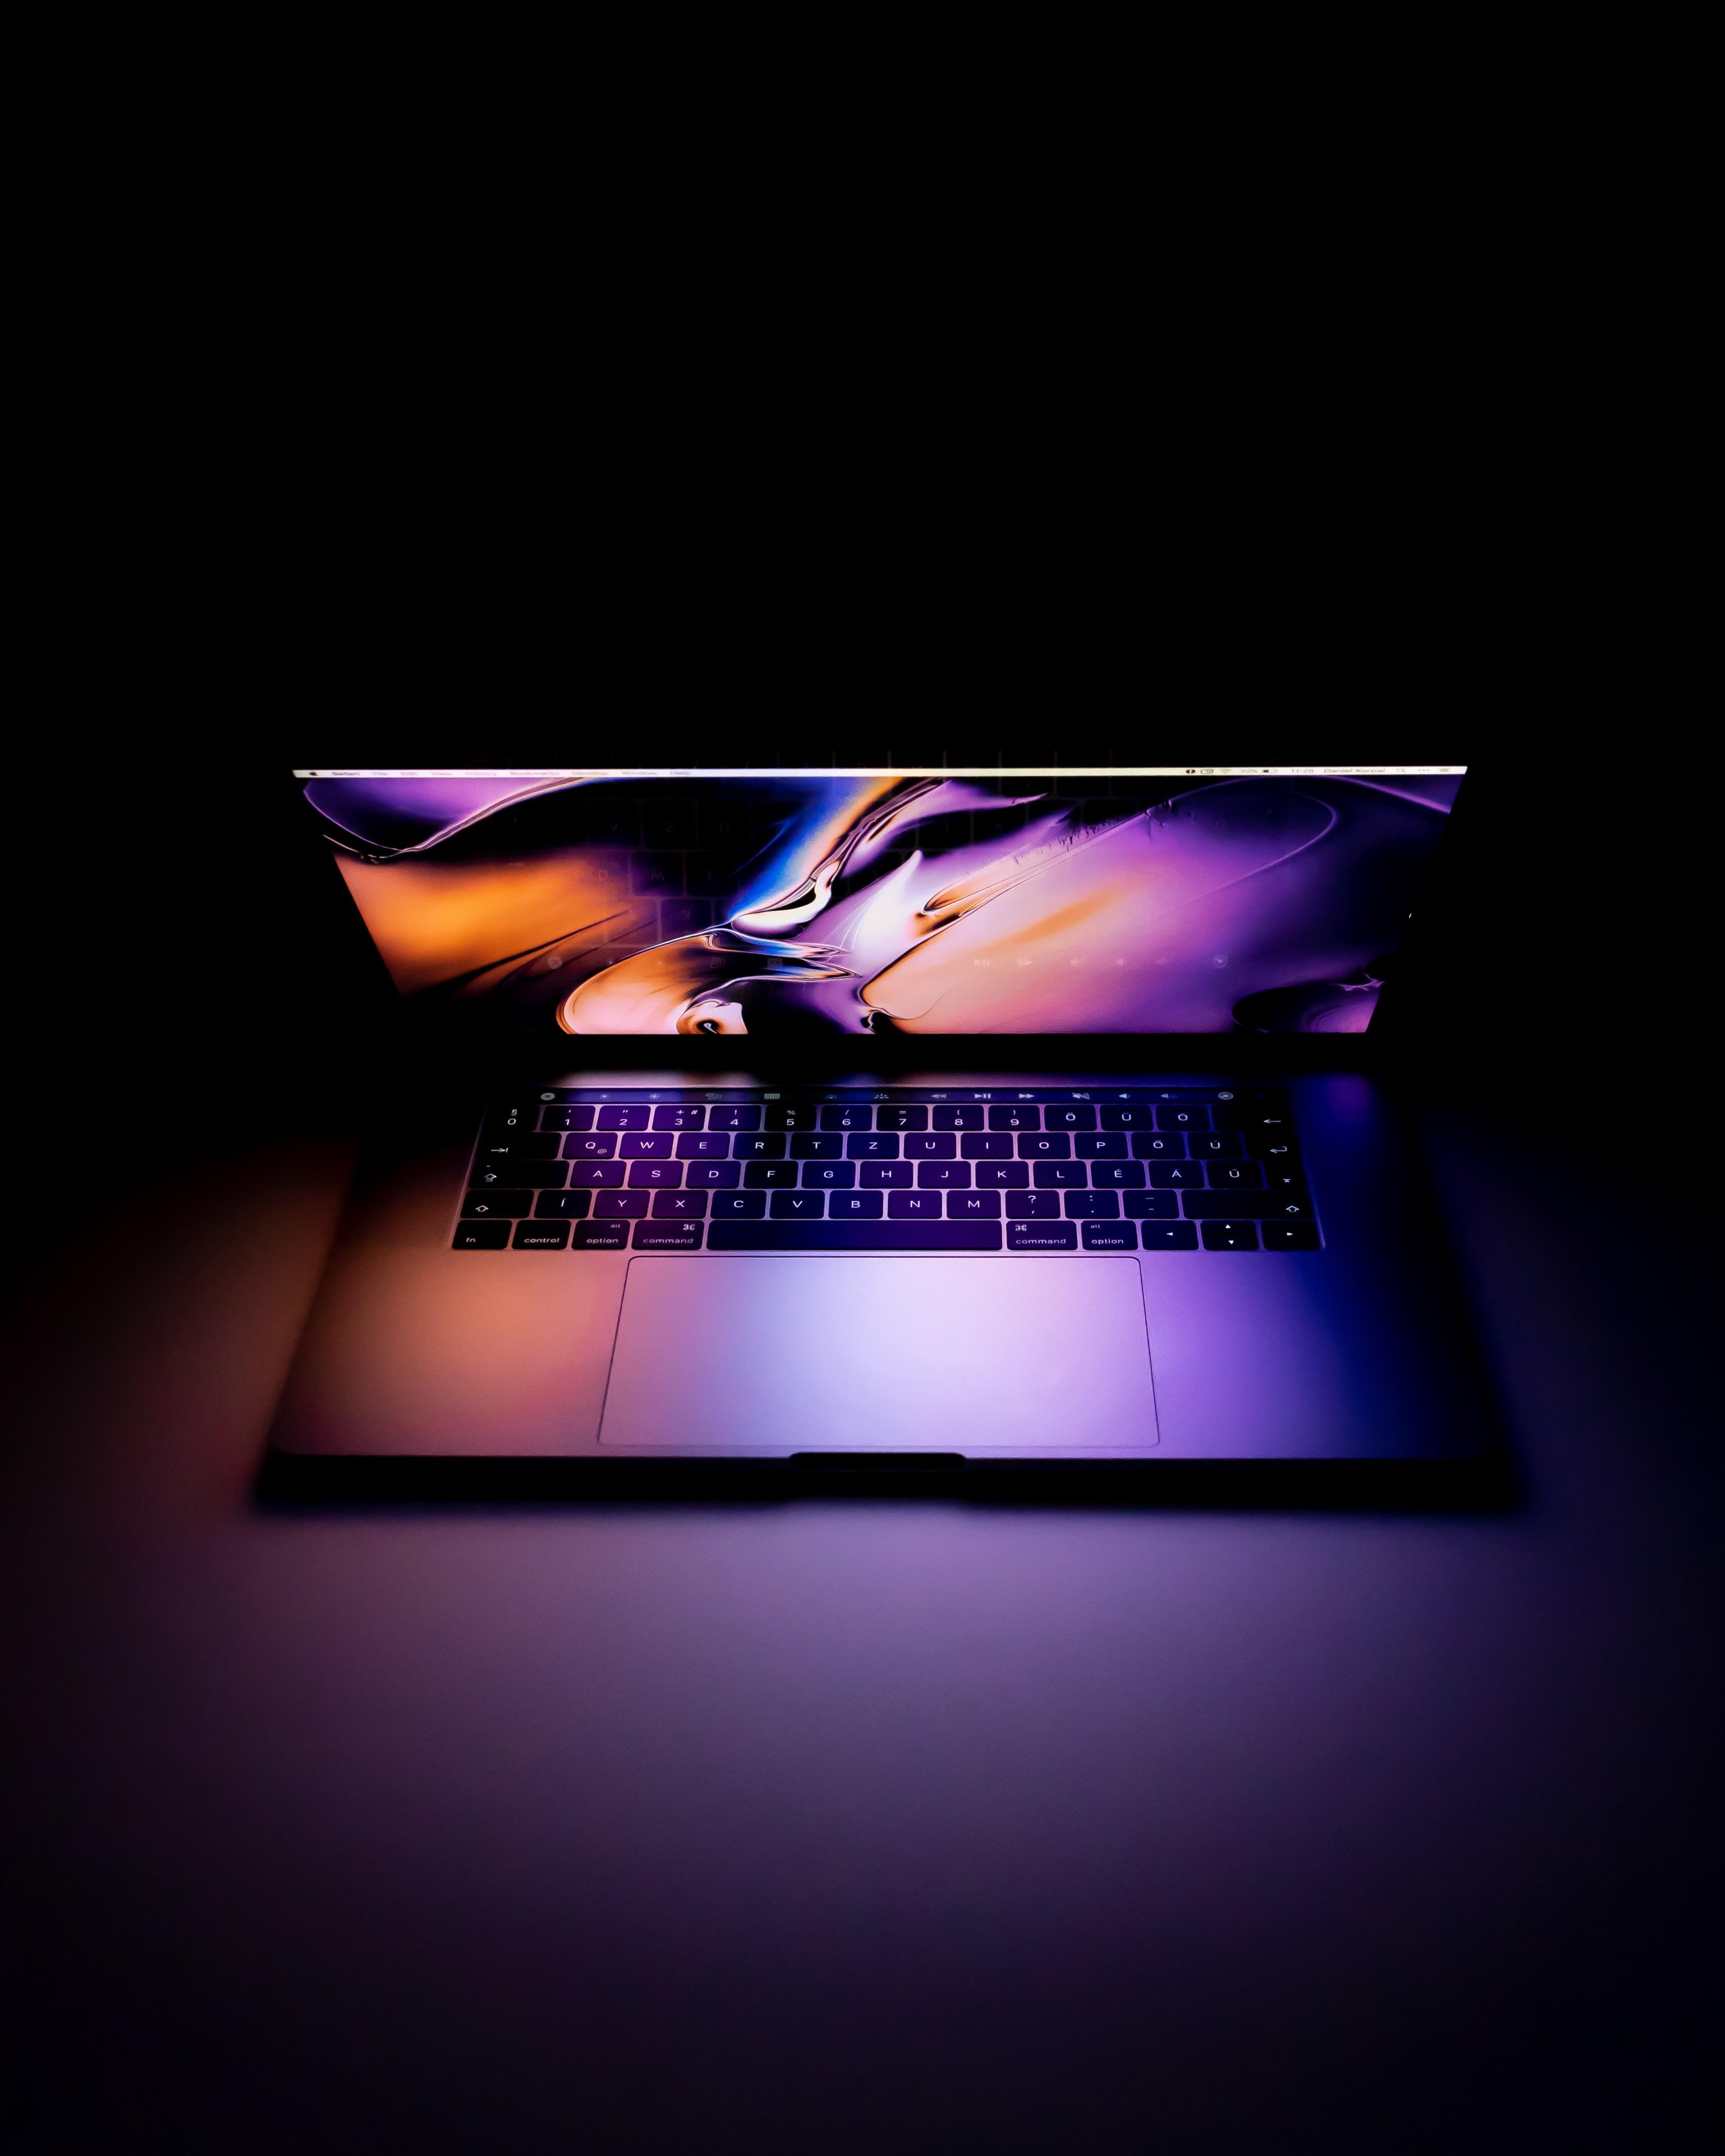 apple-extends-independent-repair-program-to-macs-after-us-antitrust-investigation-20200818-1